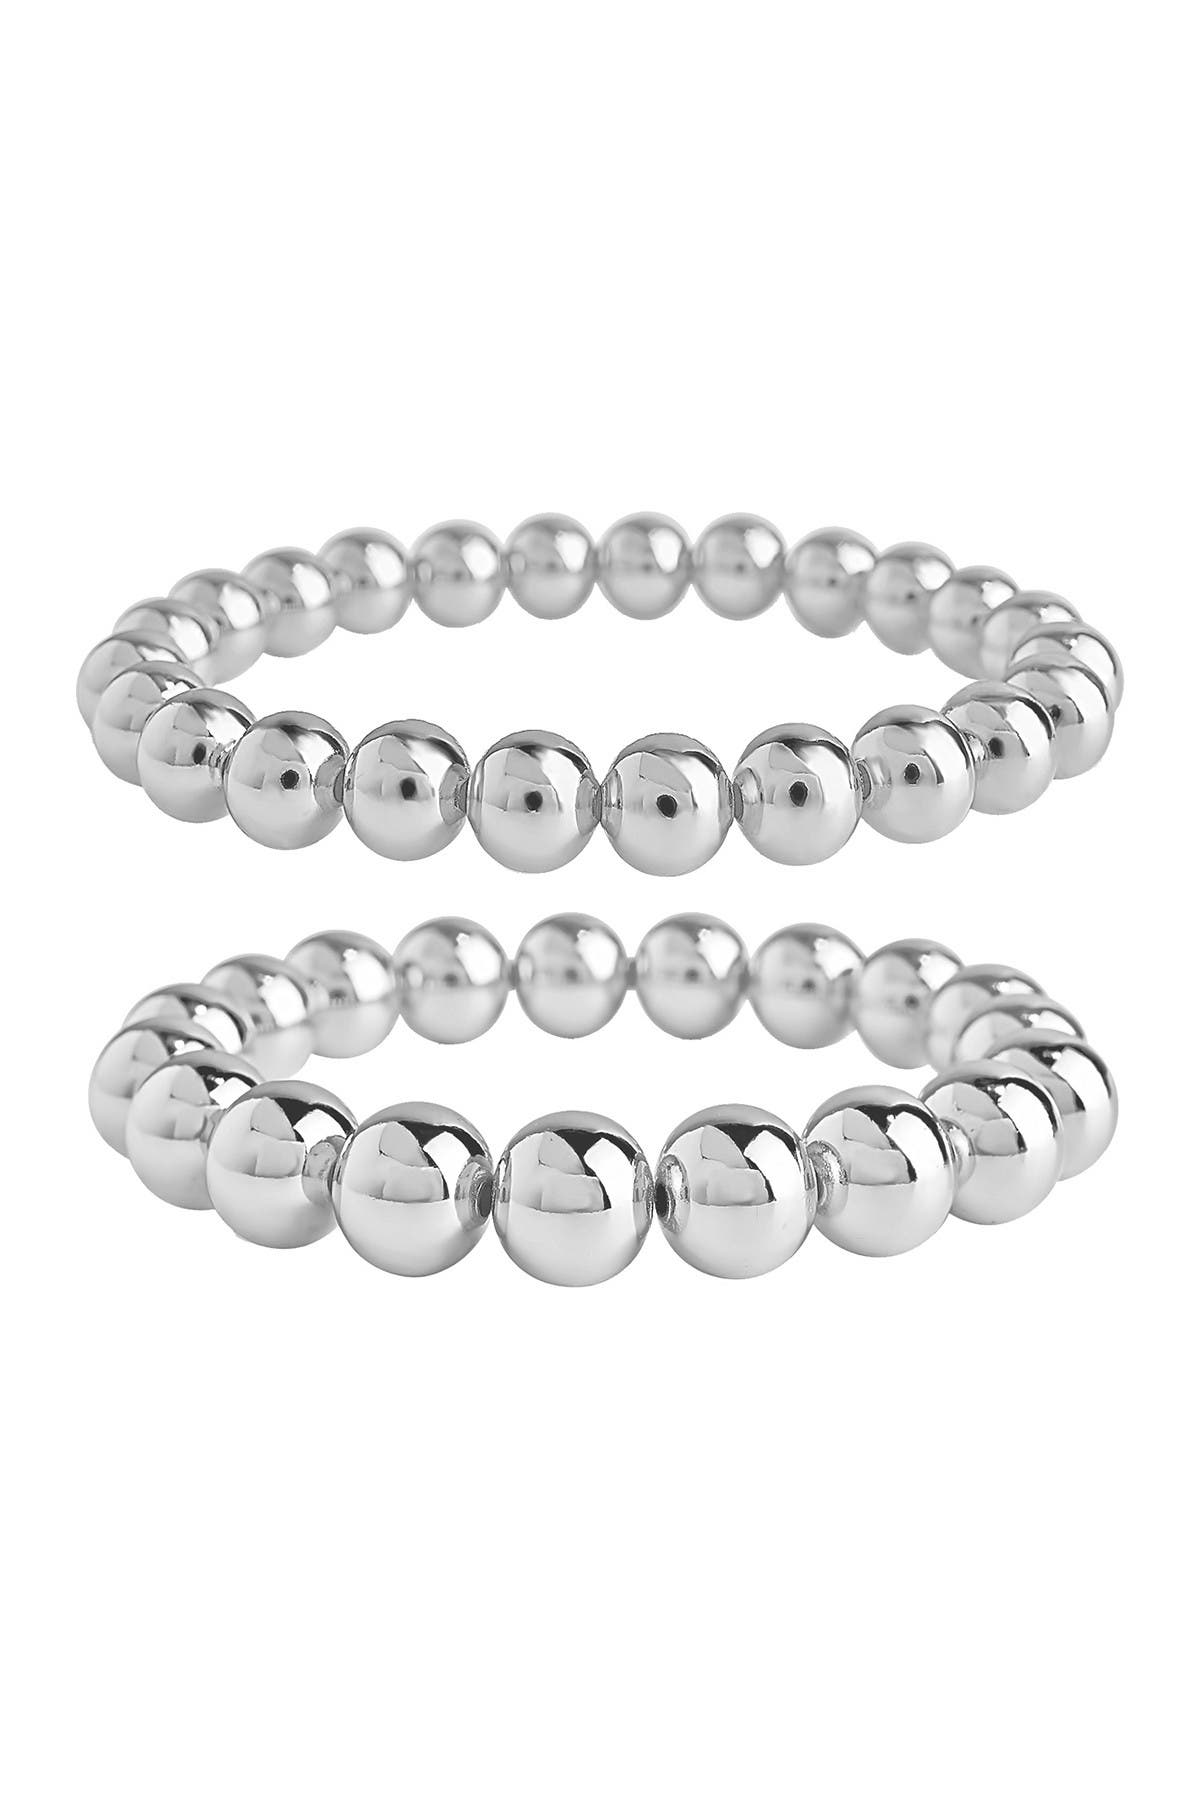 Image of Sterling Forever Rhodium Plated Beaded Expandable Bracelet Set